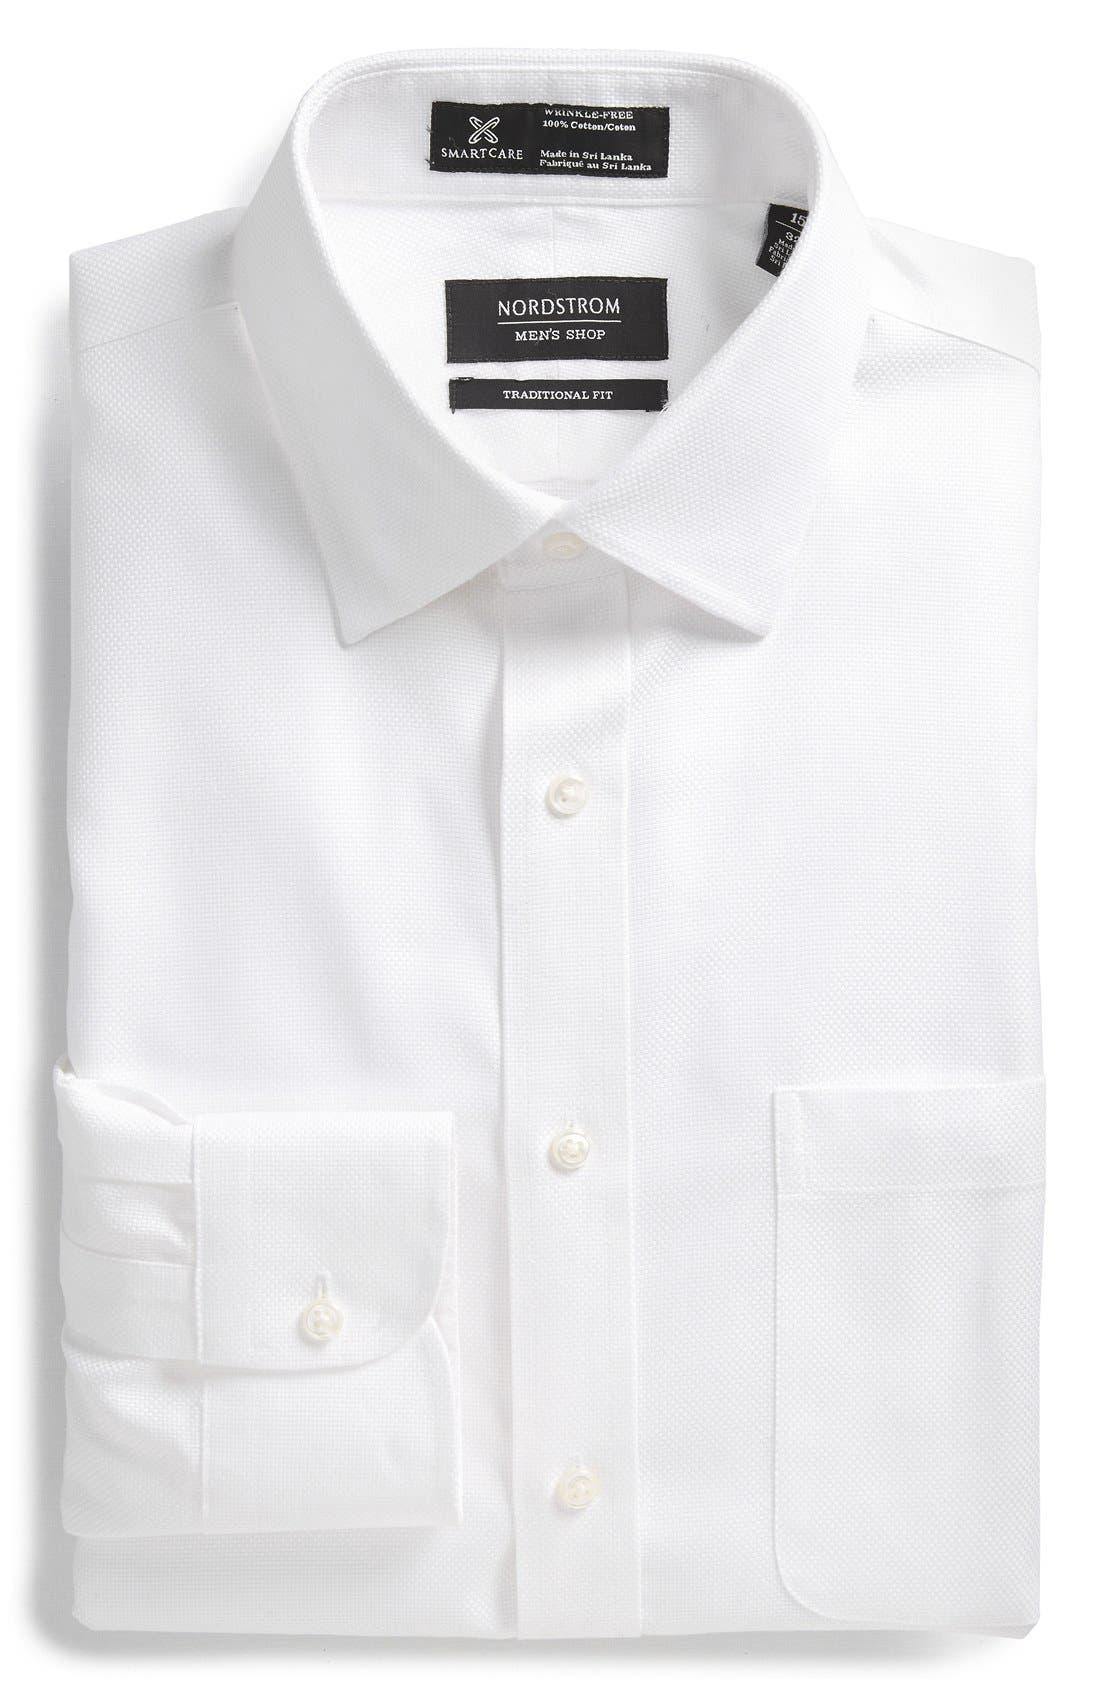 Main Image - Nordstrom Men's Shop Smartcare™ Traditional Fit Solid Dress Shirt